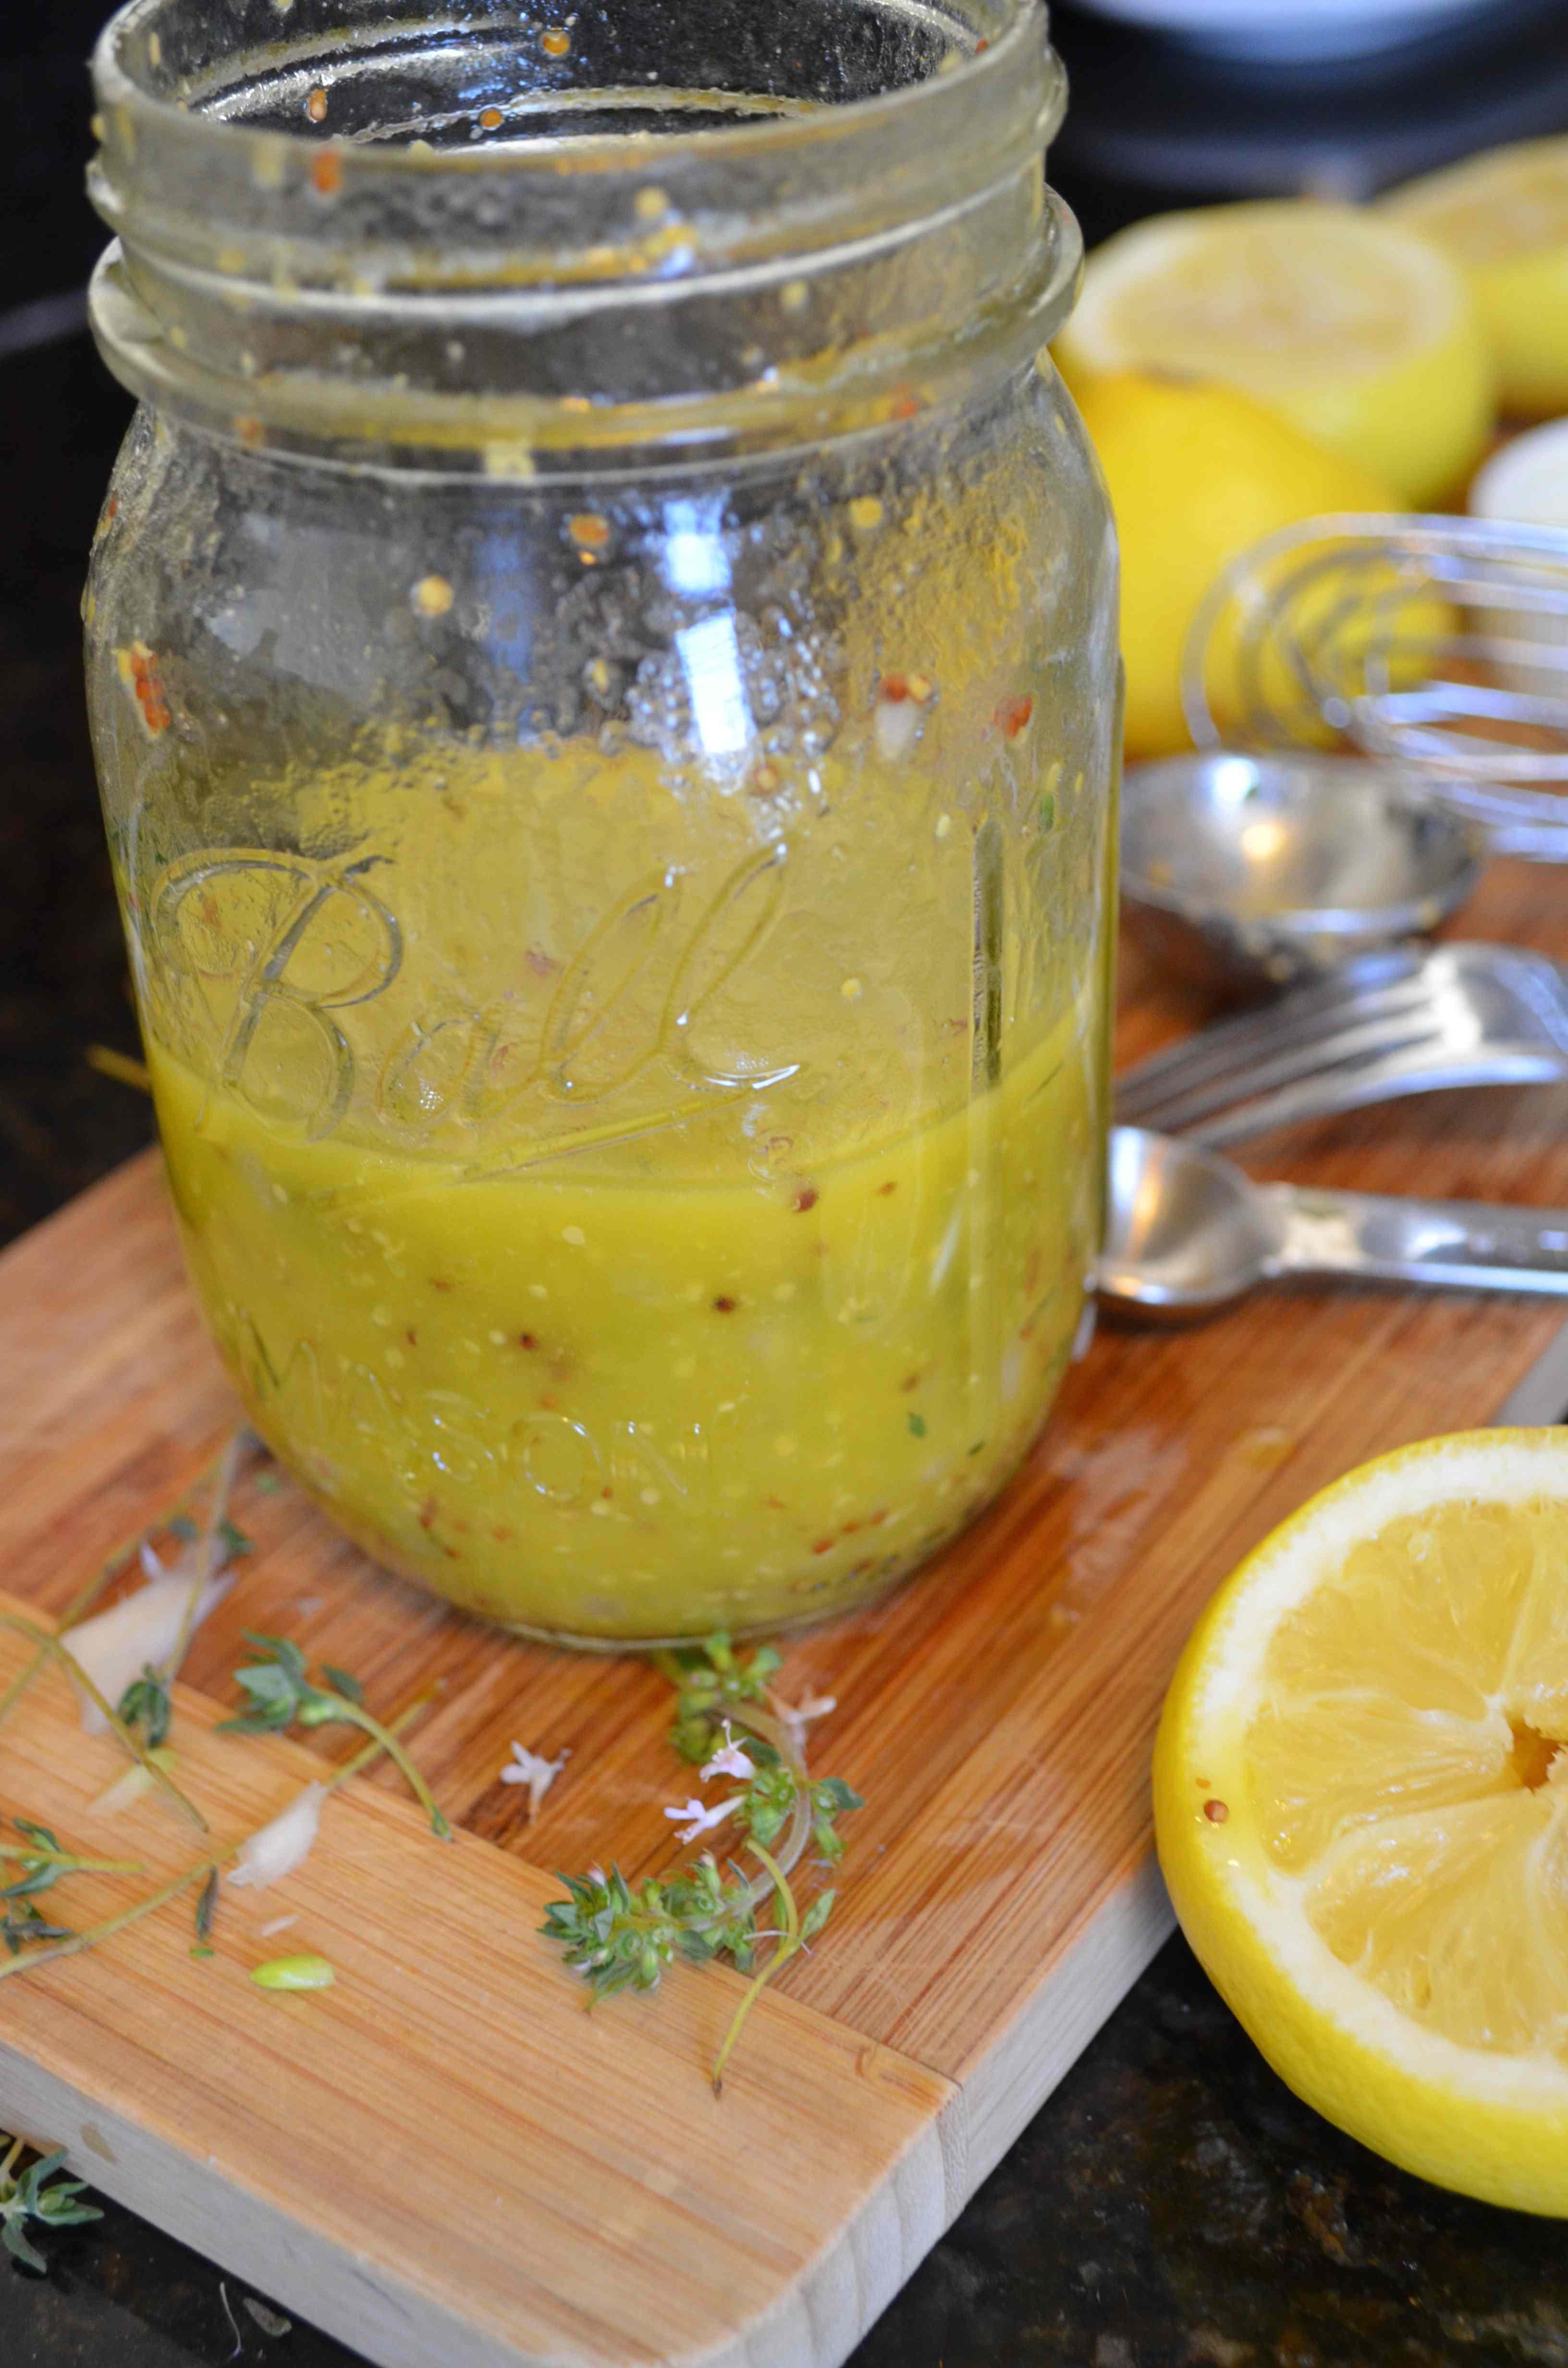 Maria Provenzano's Lemon, Mustard, and Thyme Salad Dressing